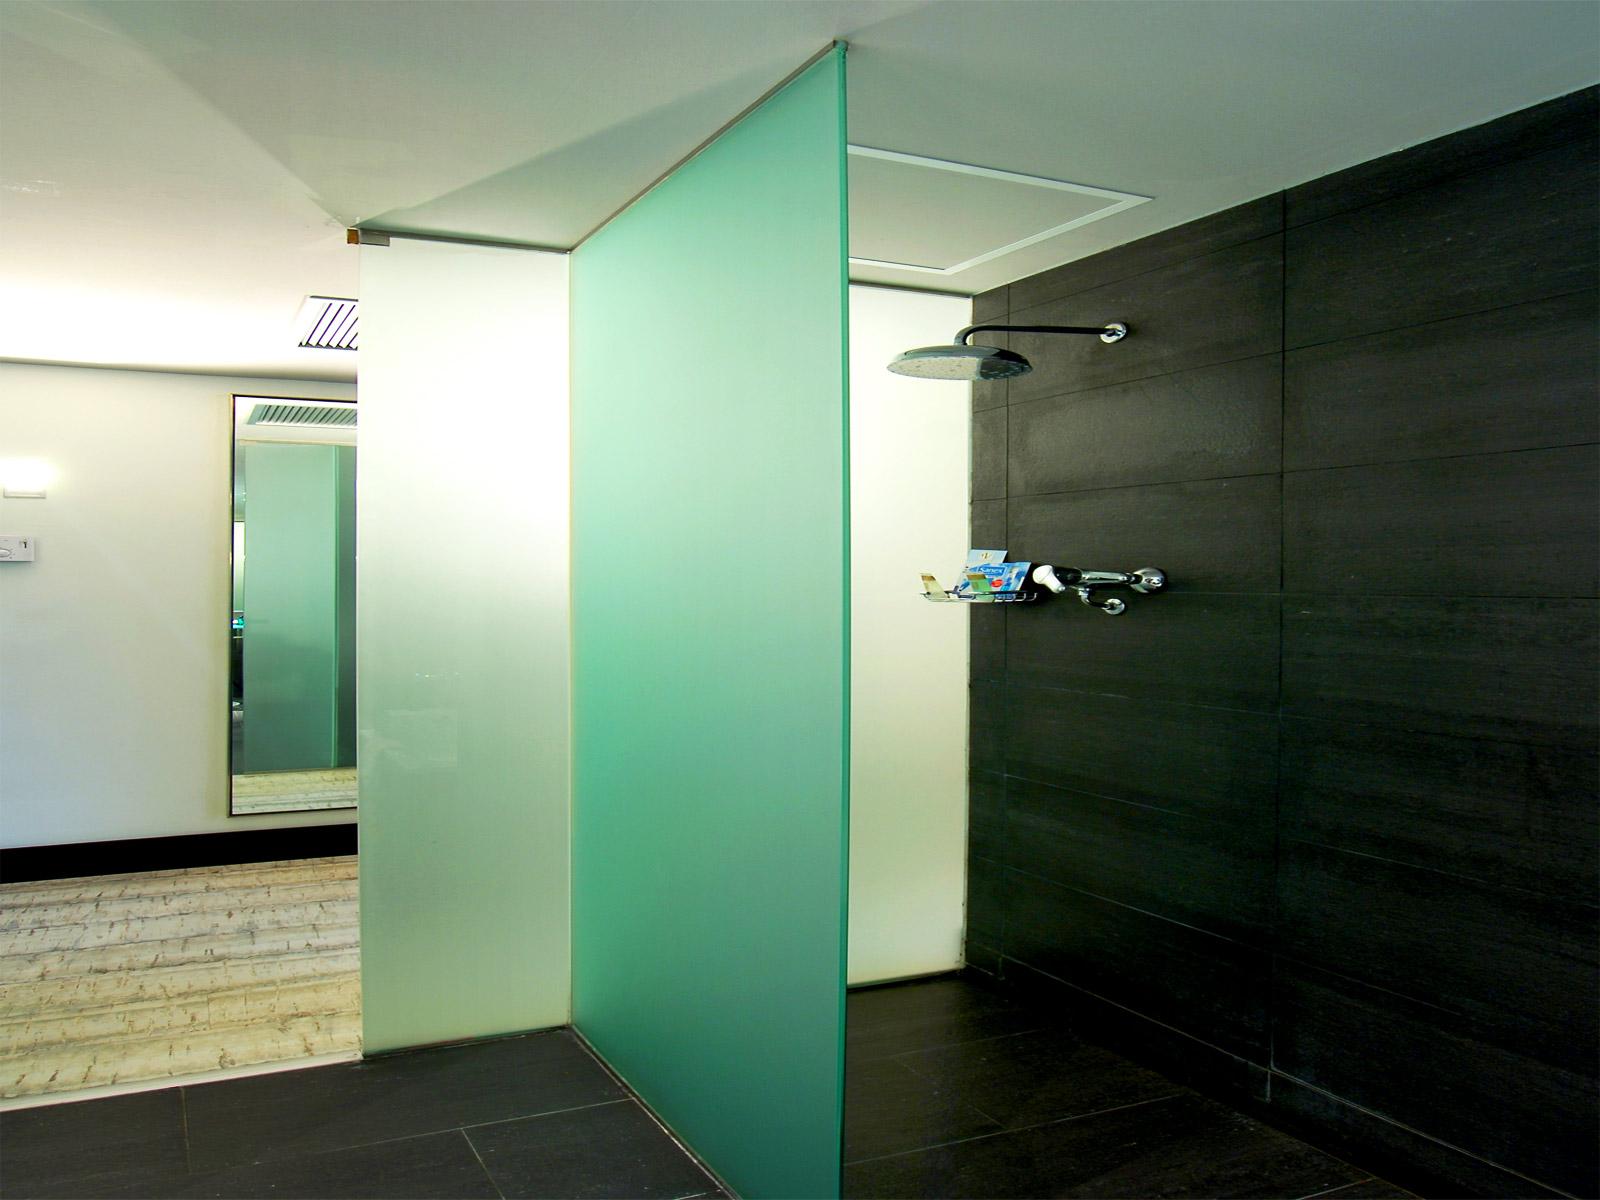 Rooms-Hotel Maritimo Barcelona- Vincci Hotels